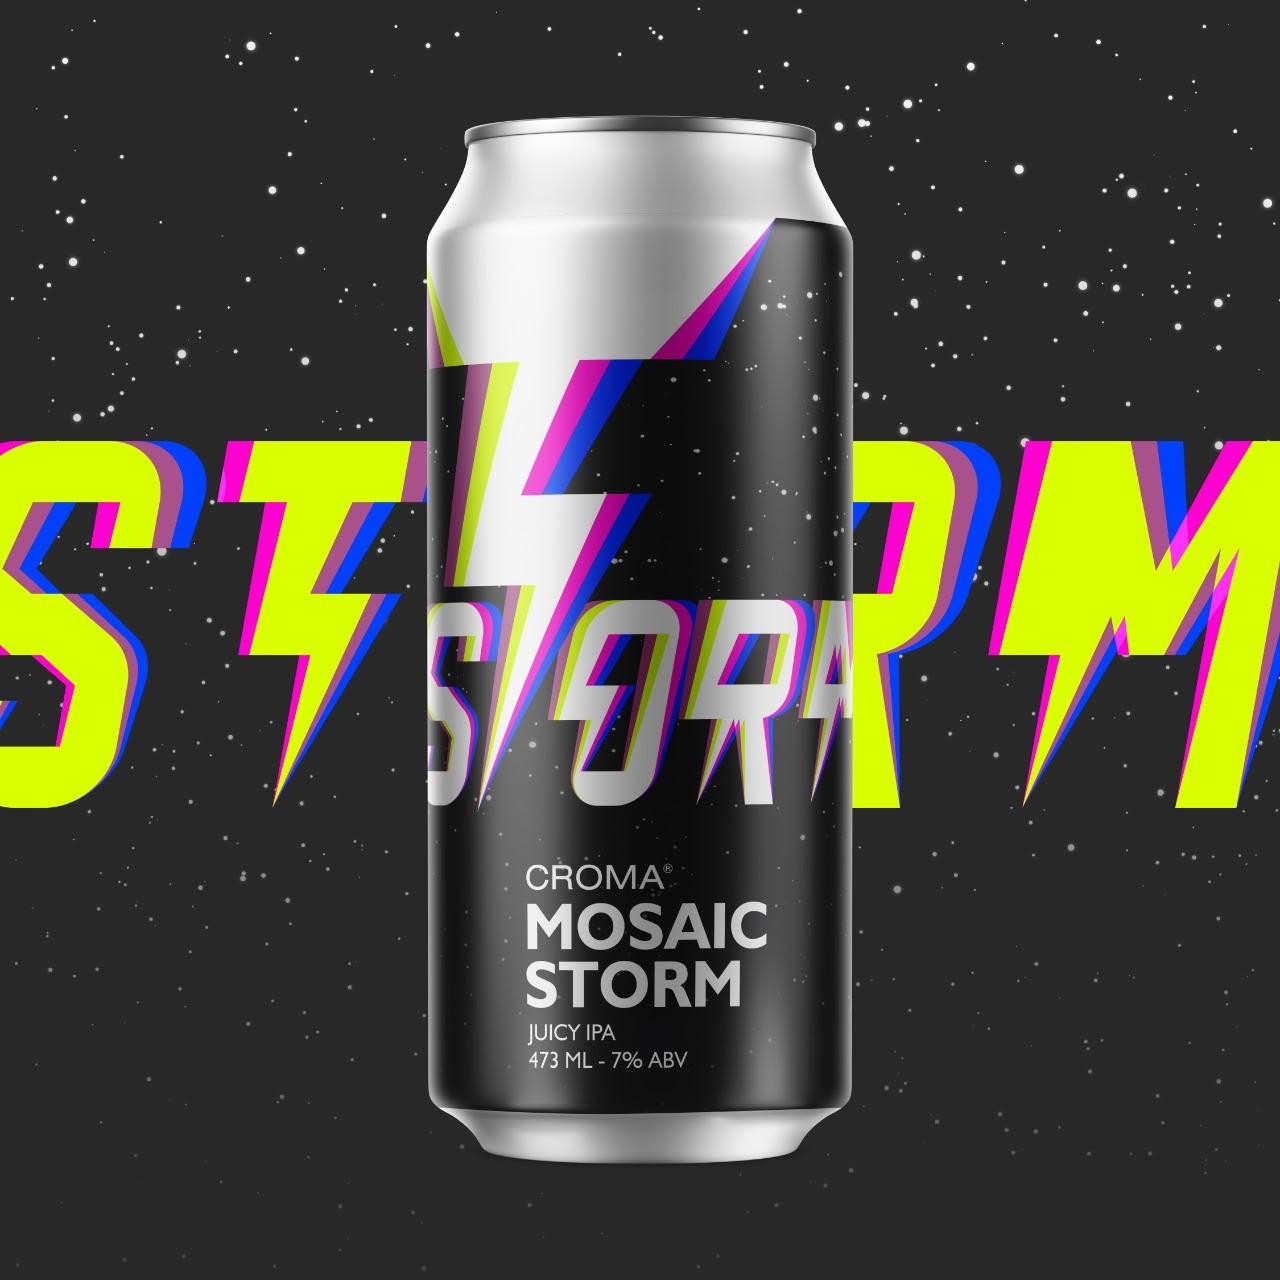 Croma Mosaic Storm Juicy Ipa Lata 473ml